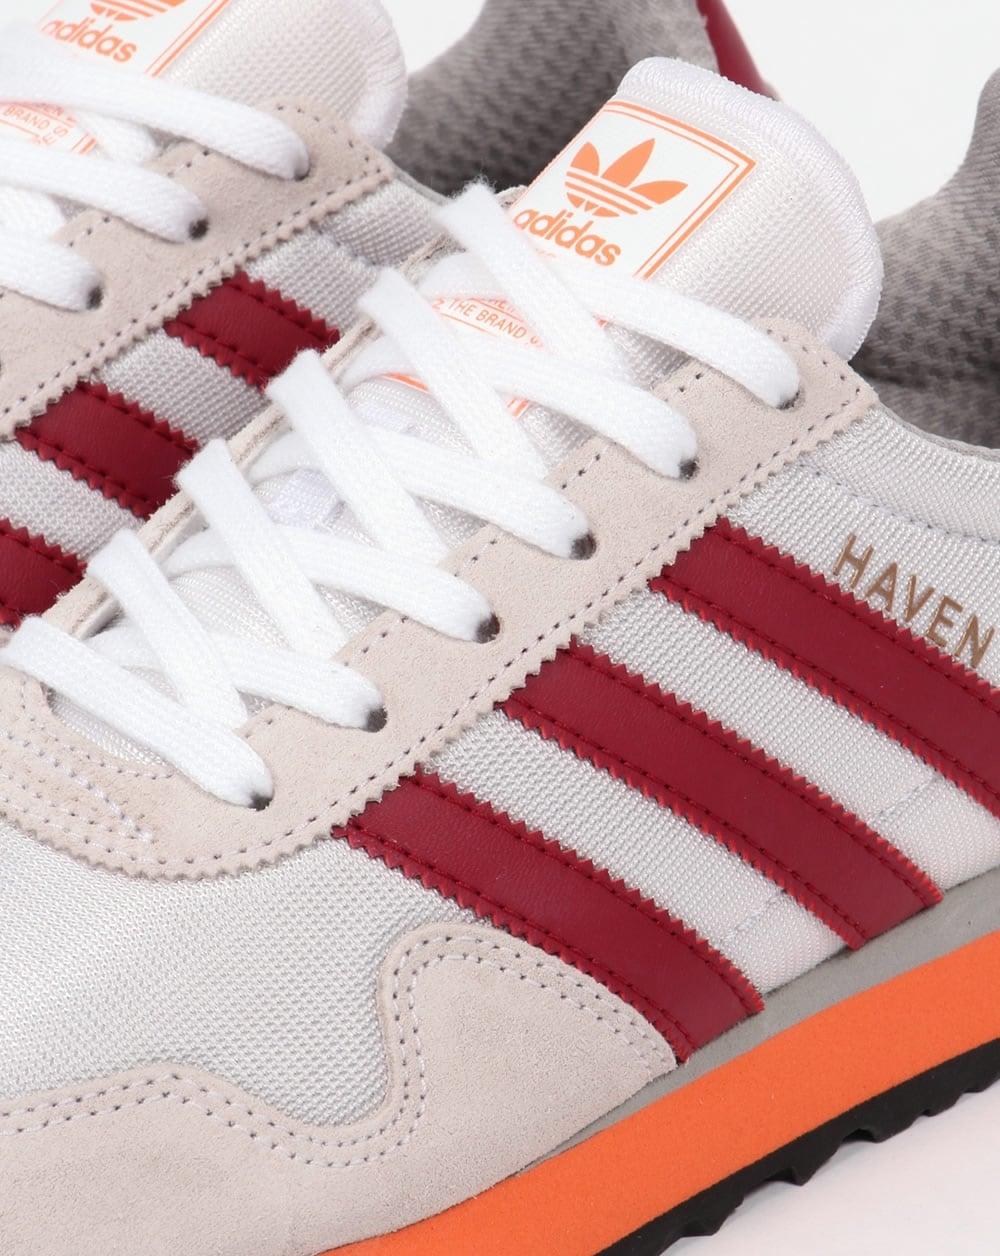 Adidas Haven Trainers WhiteBurgundy Red